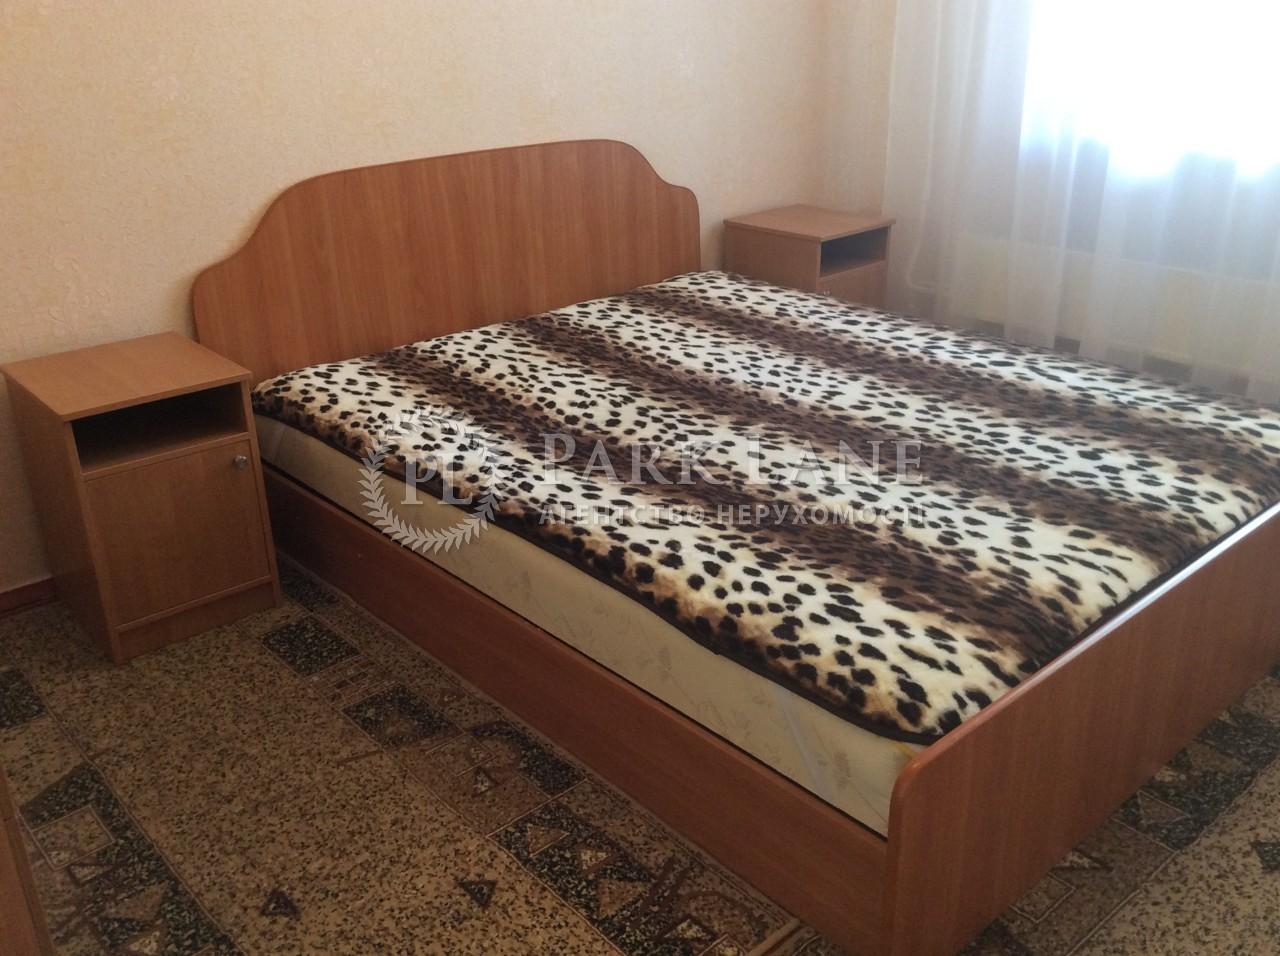 Квартира ул. Ахматовой, 25, Киев, R-5630 - Фото 3